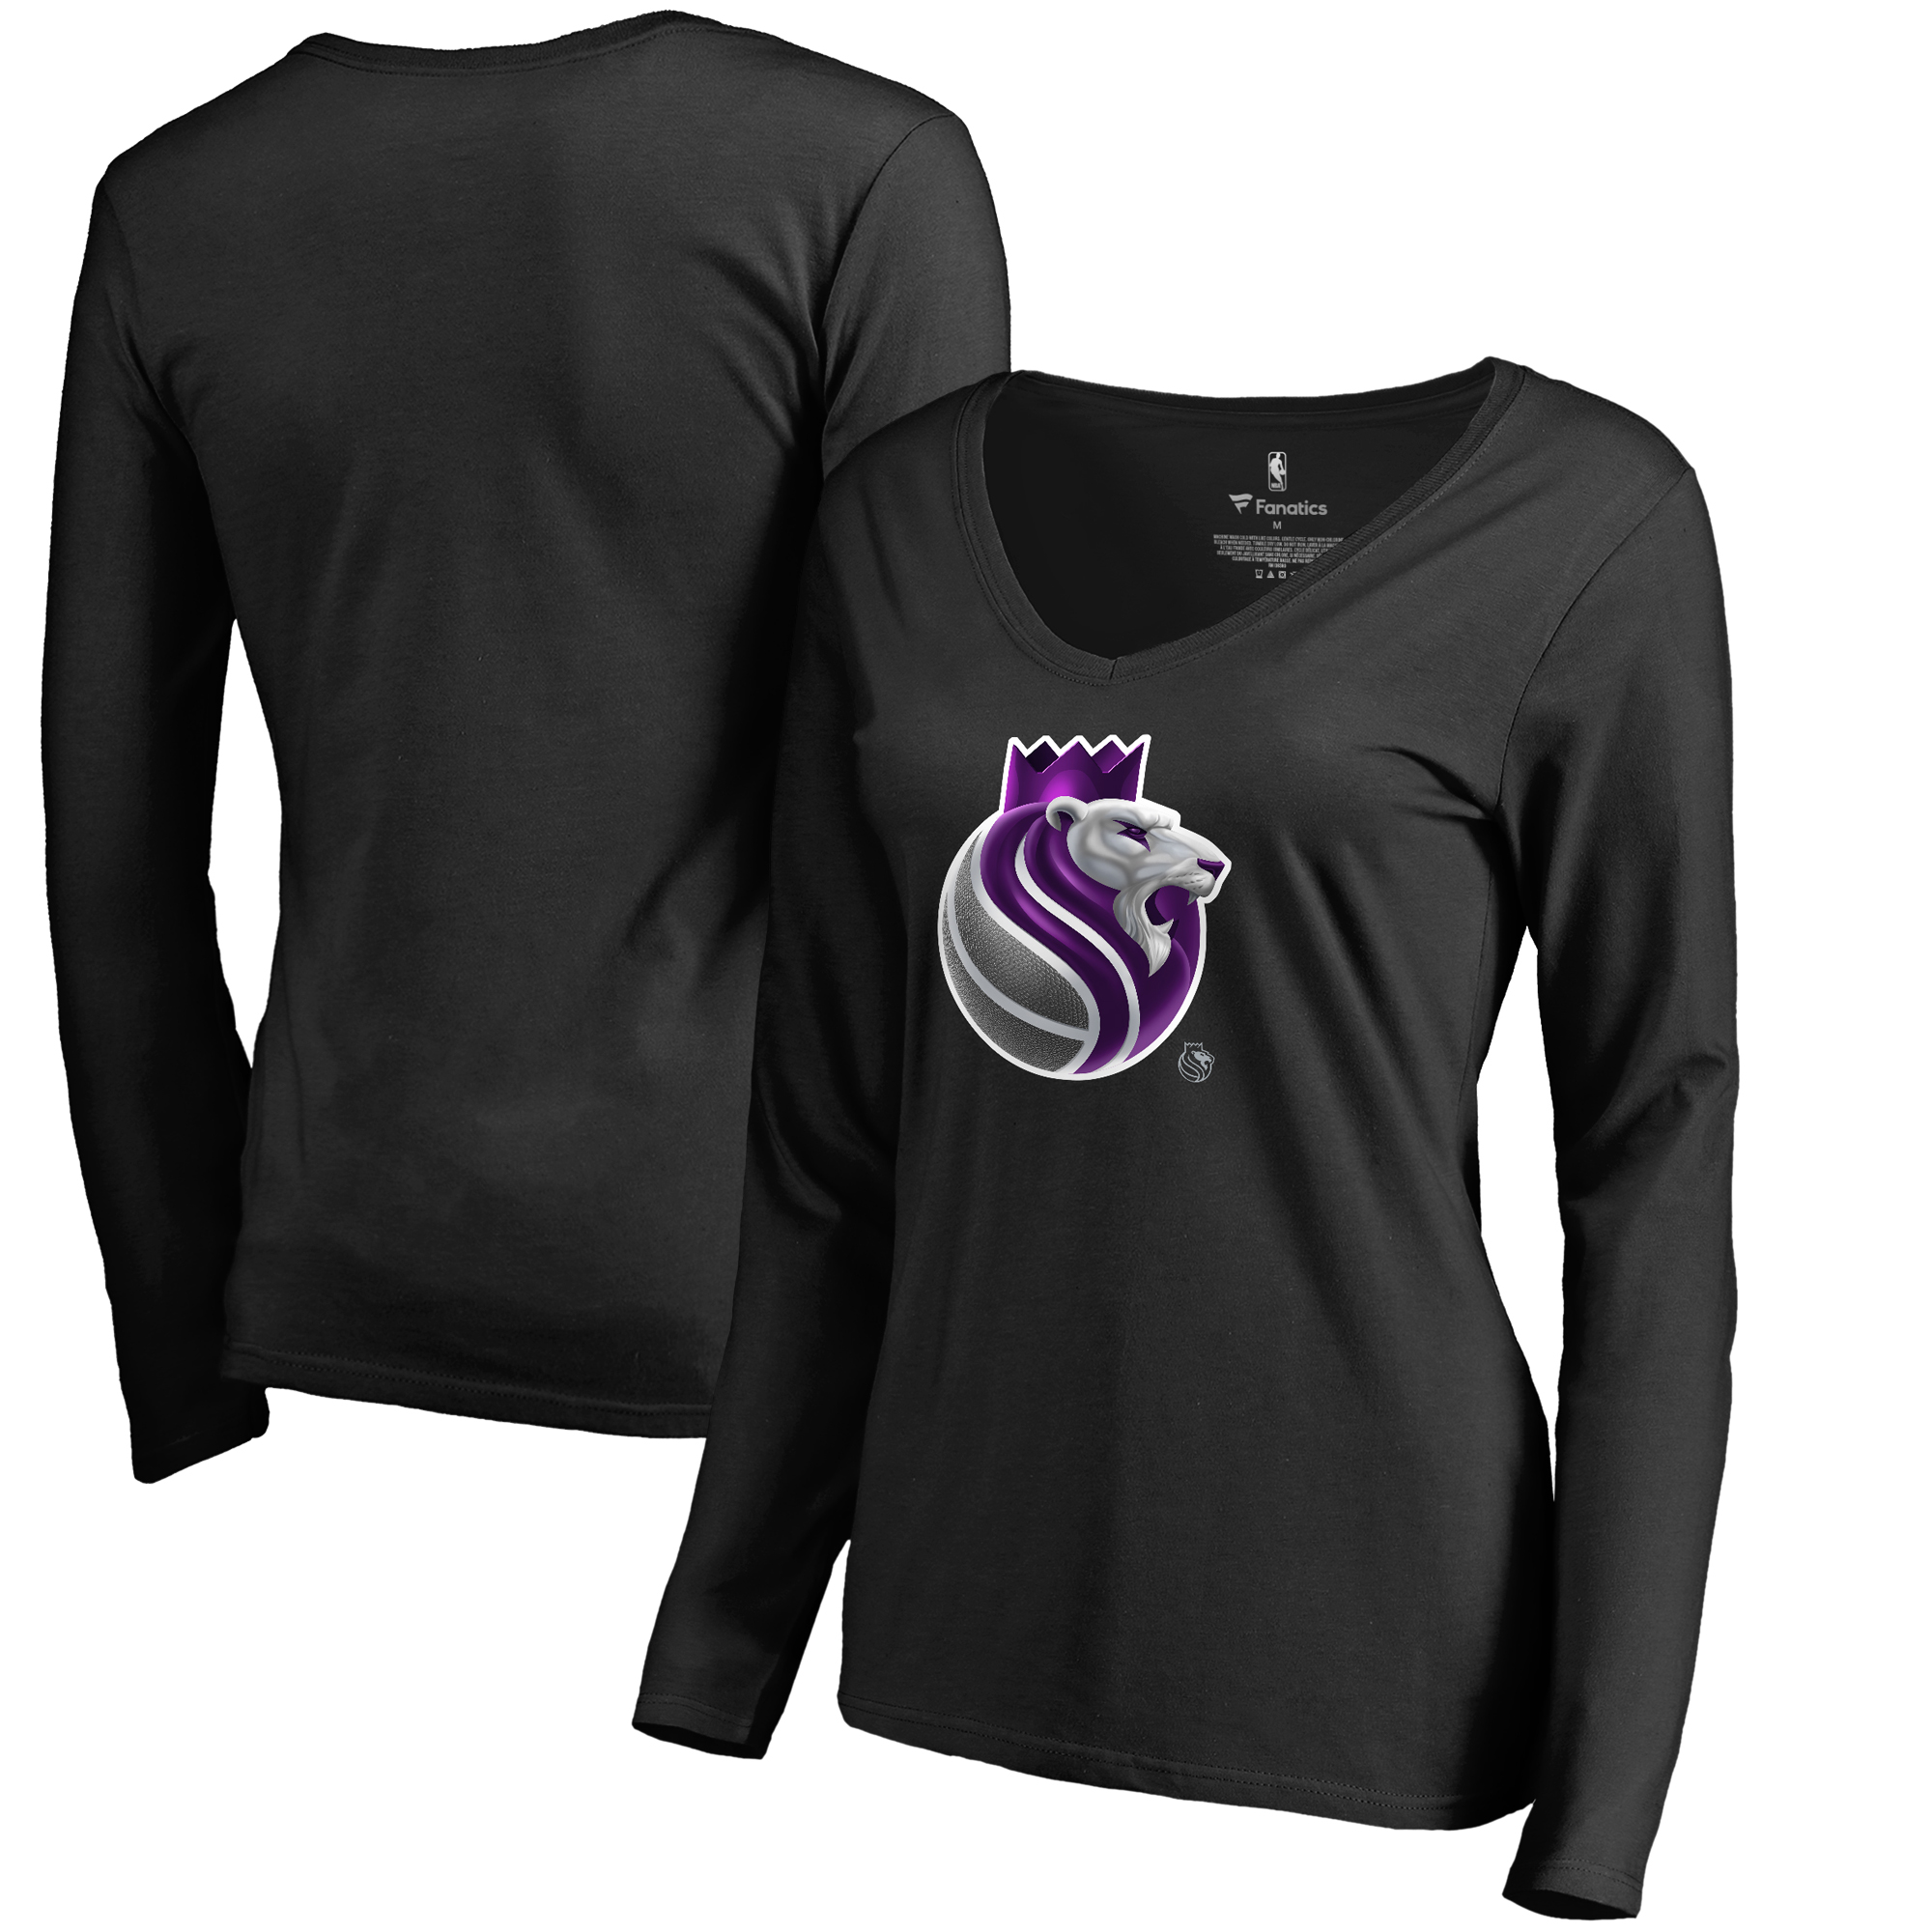 Sacramento Kings Fanatics Branded Women's Midnight Mascot Long Sleeve V-Neck T-Shirt - Black